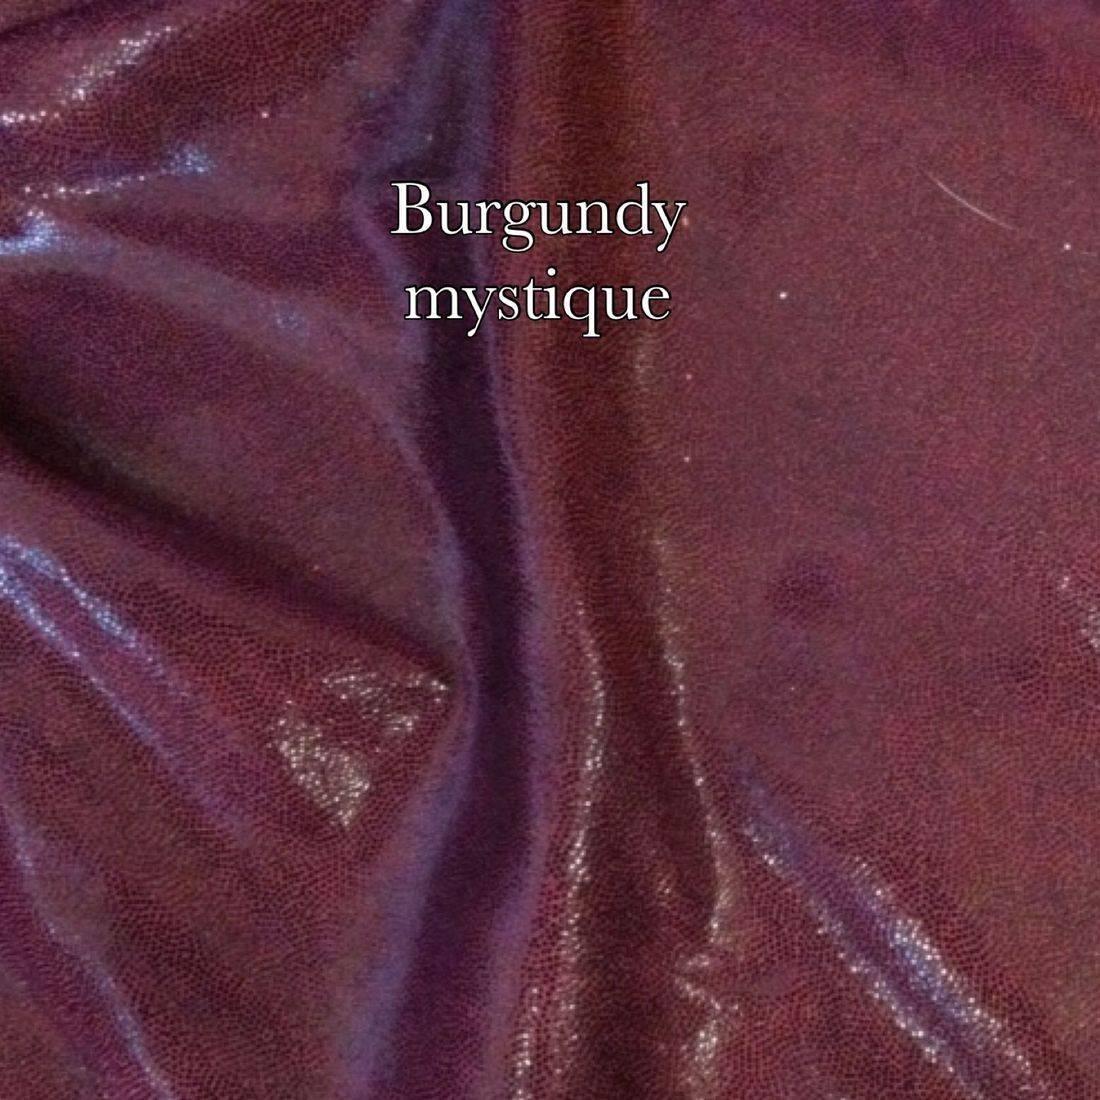 Burgundy mystique